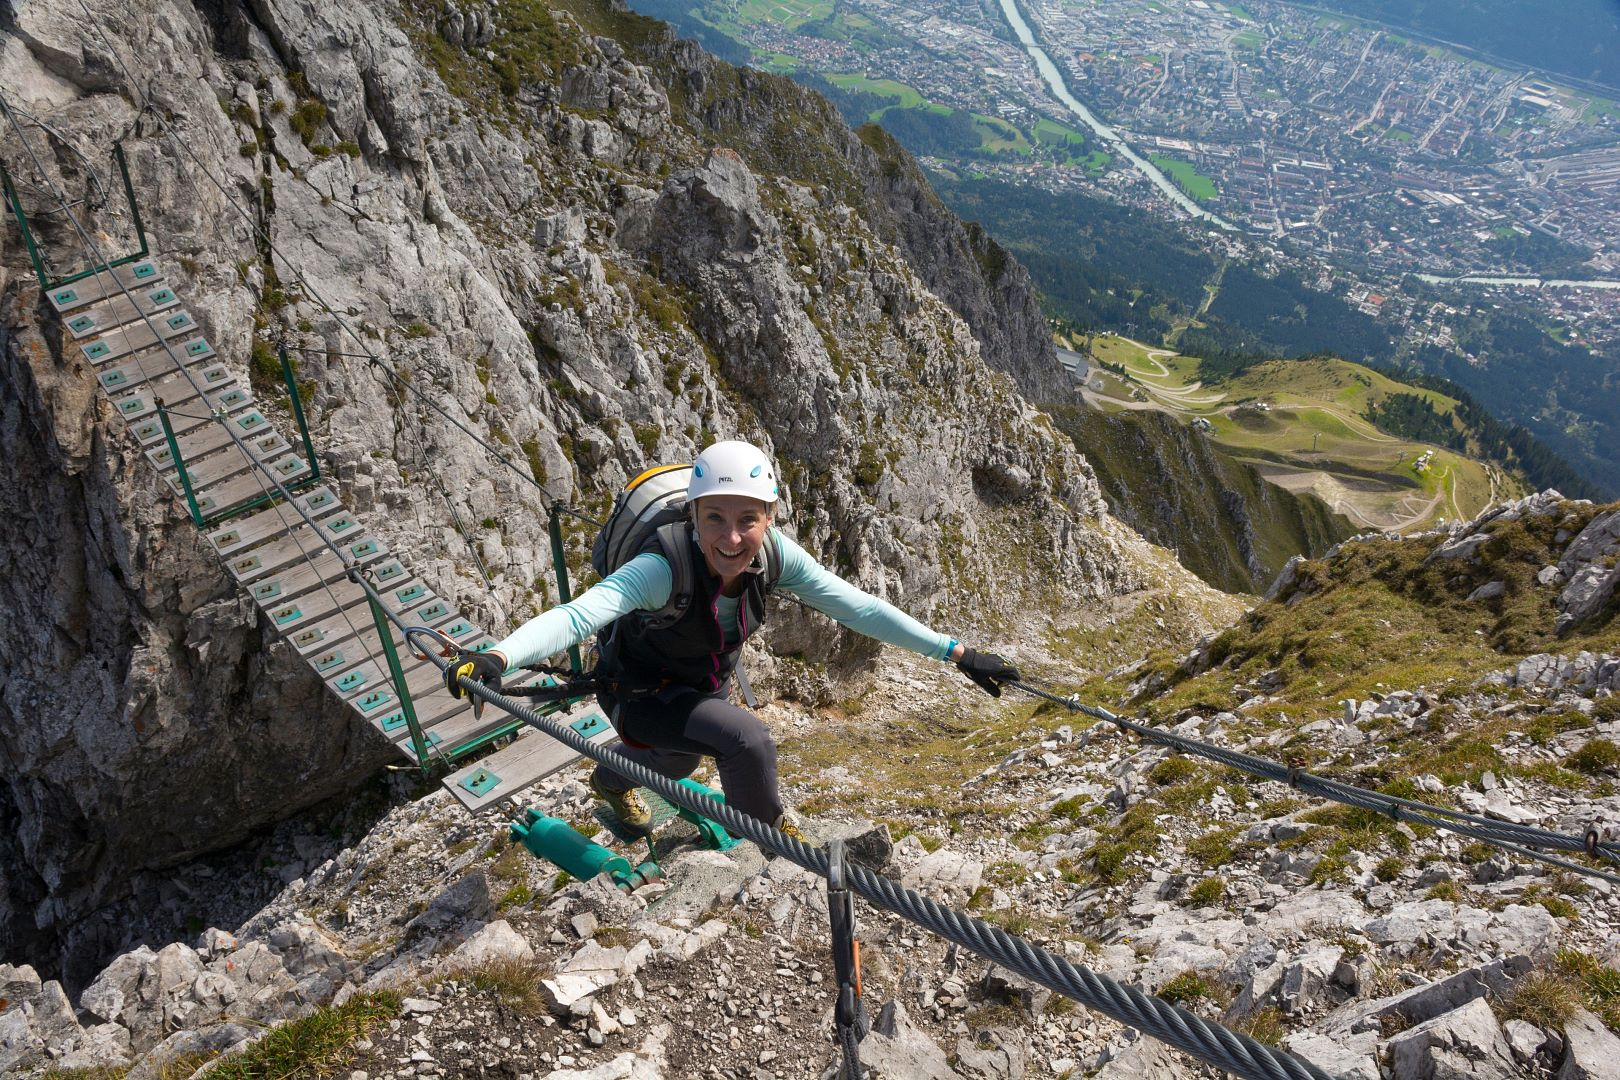 Klettersteig Innsbruck : Top klettersteige in tirol bergzeit magazin